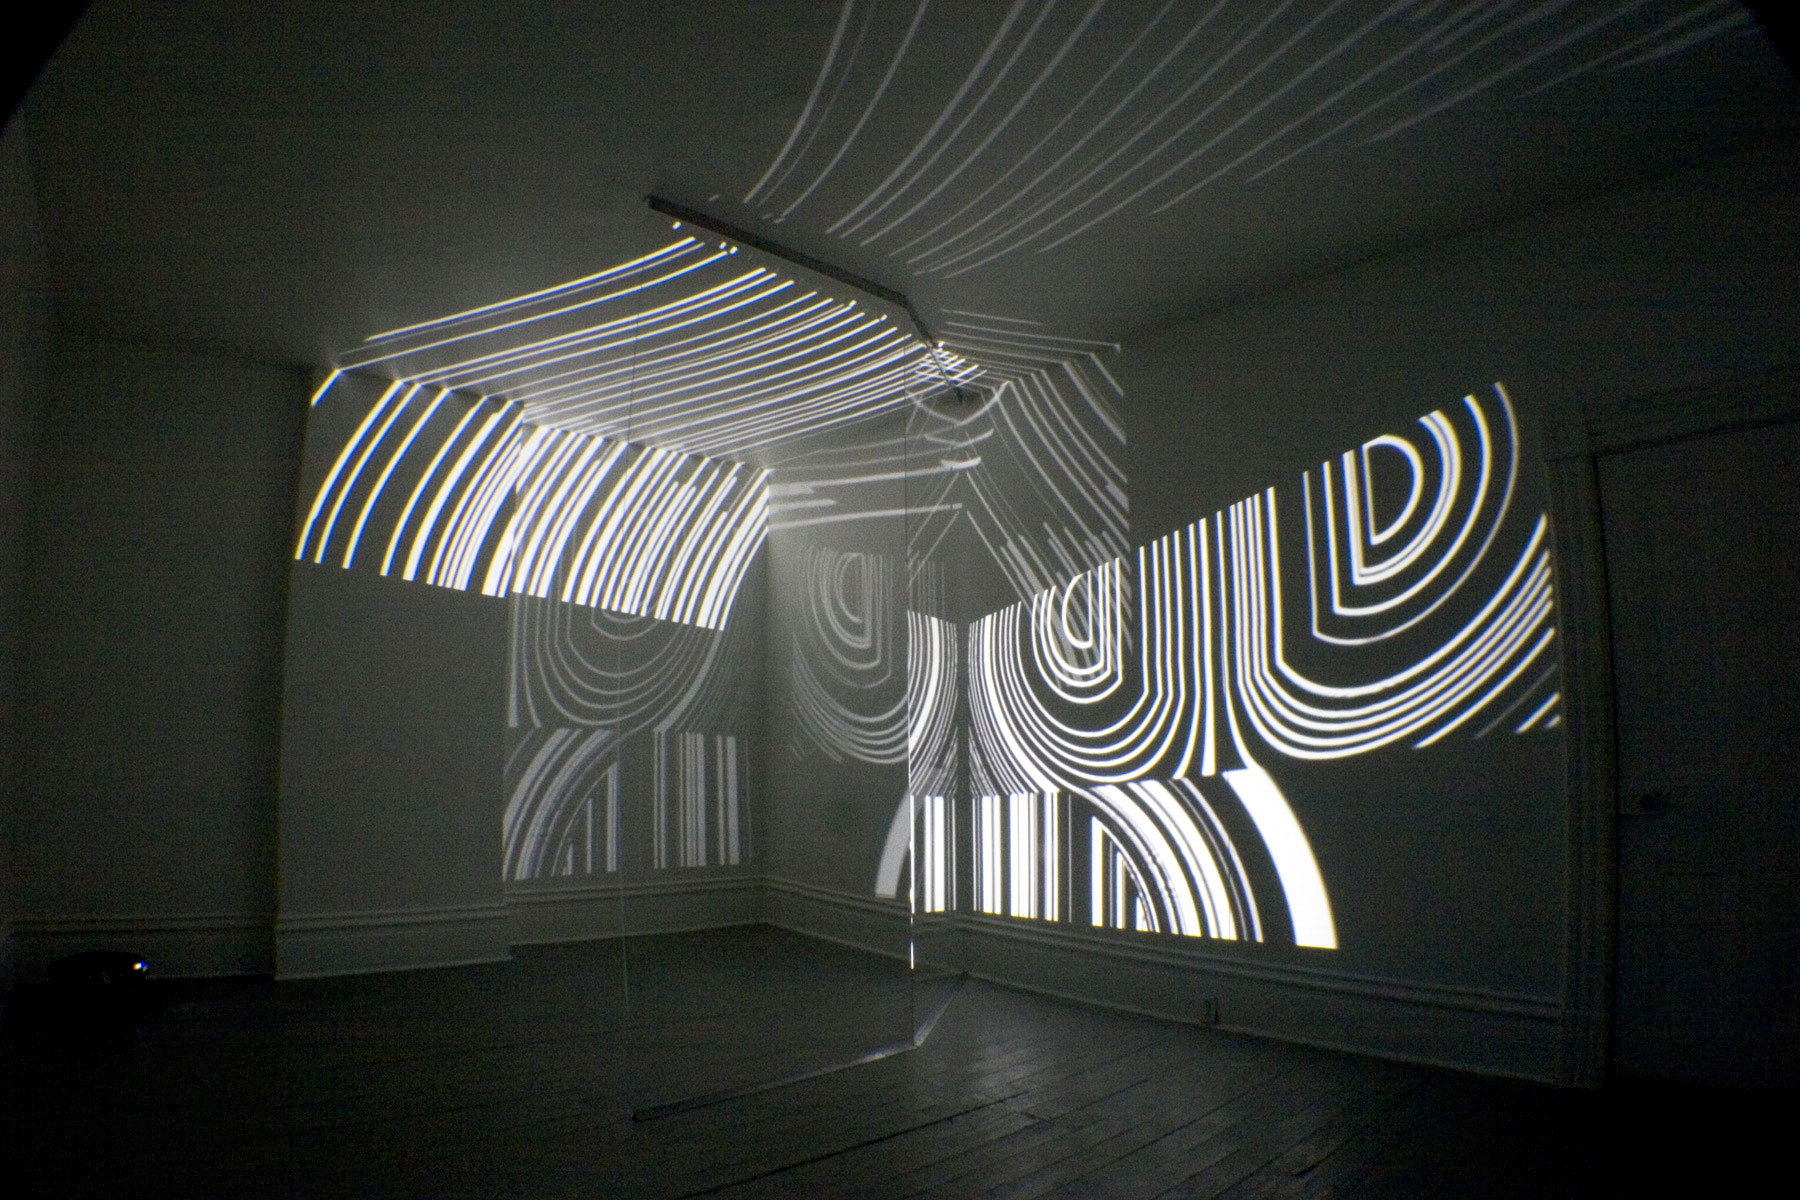 Expanding Magnetic Molten Symmetry, 2006,00:18:00 minutes loop,b/w, no audio,h 10 x l 20 x w 14 feet ,two video projections, plexiglass